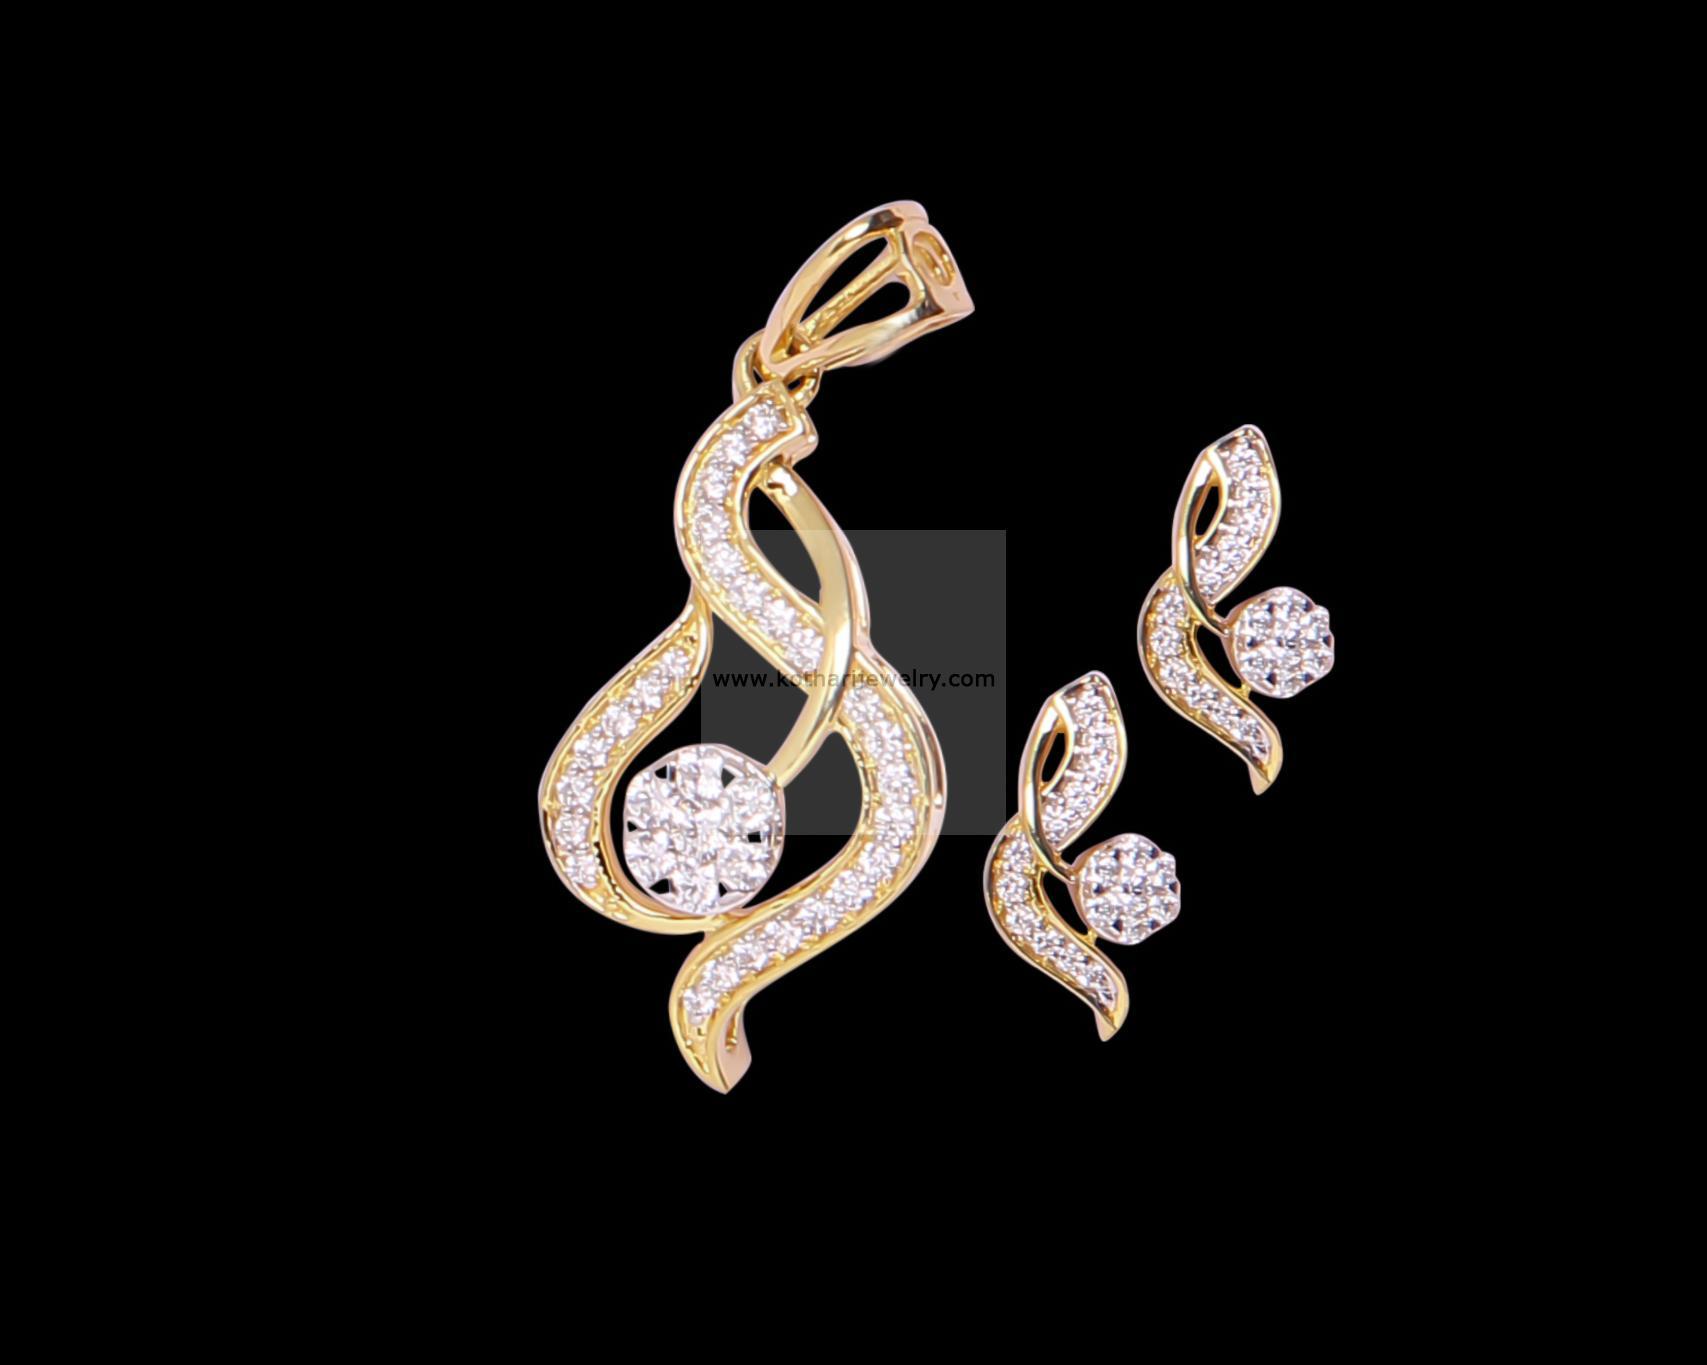 Diamond Pendants Pendant And Earrings Indian